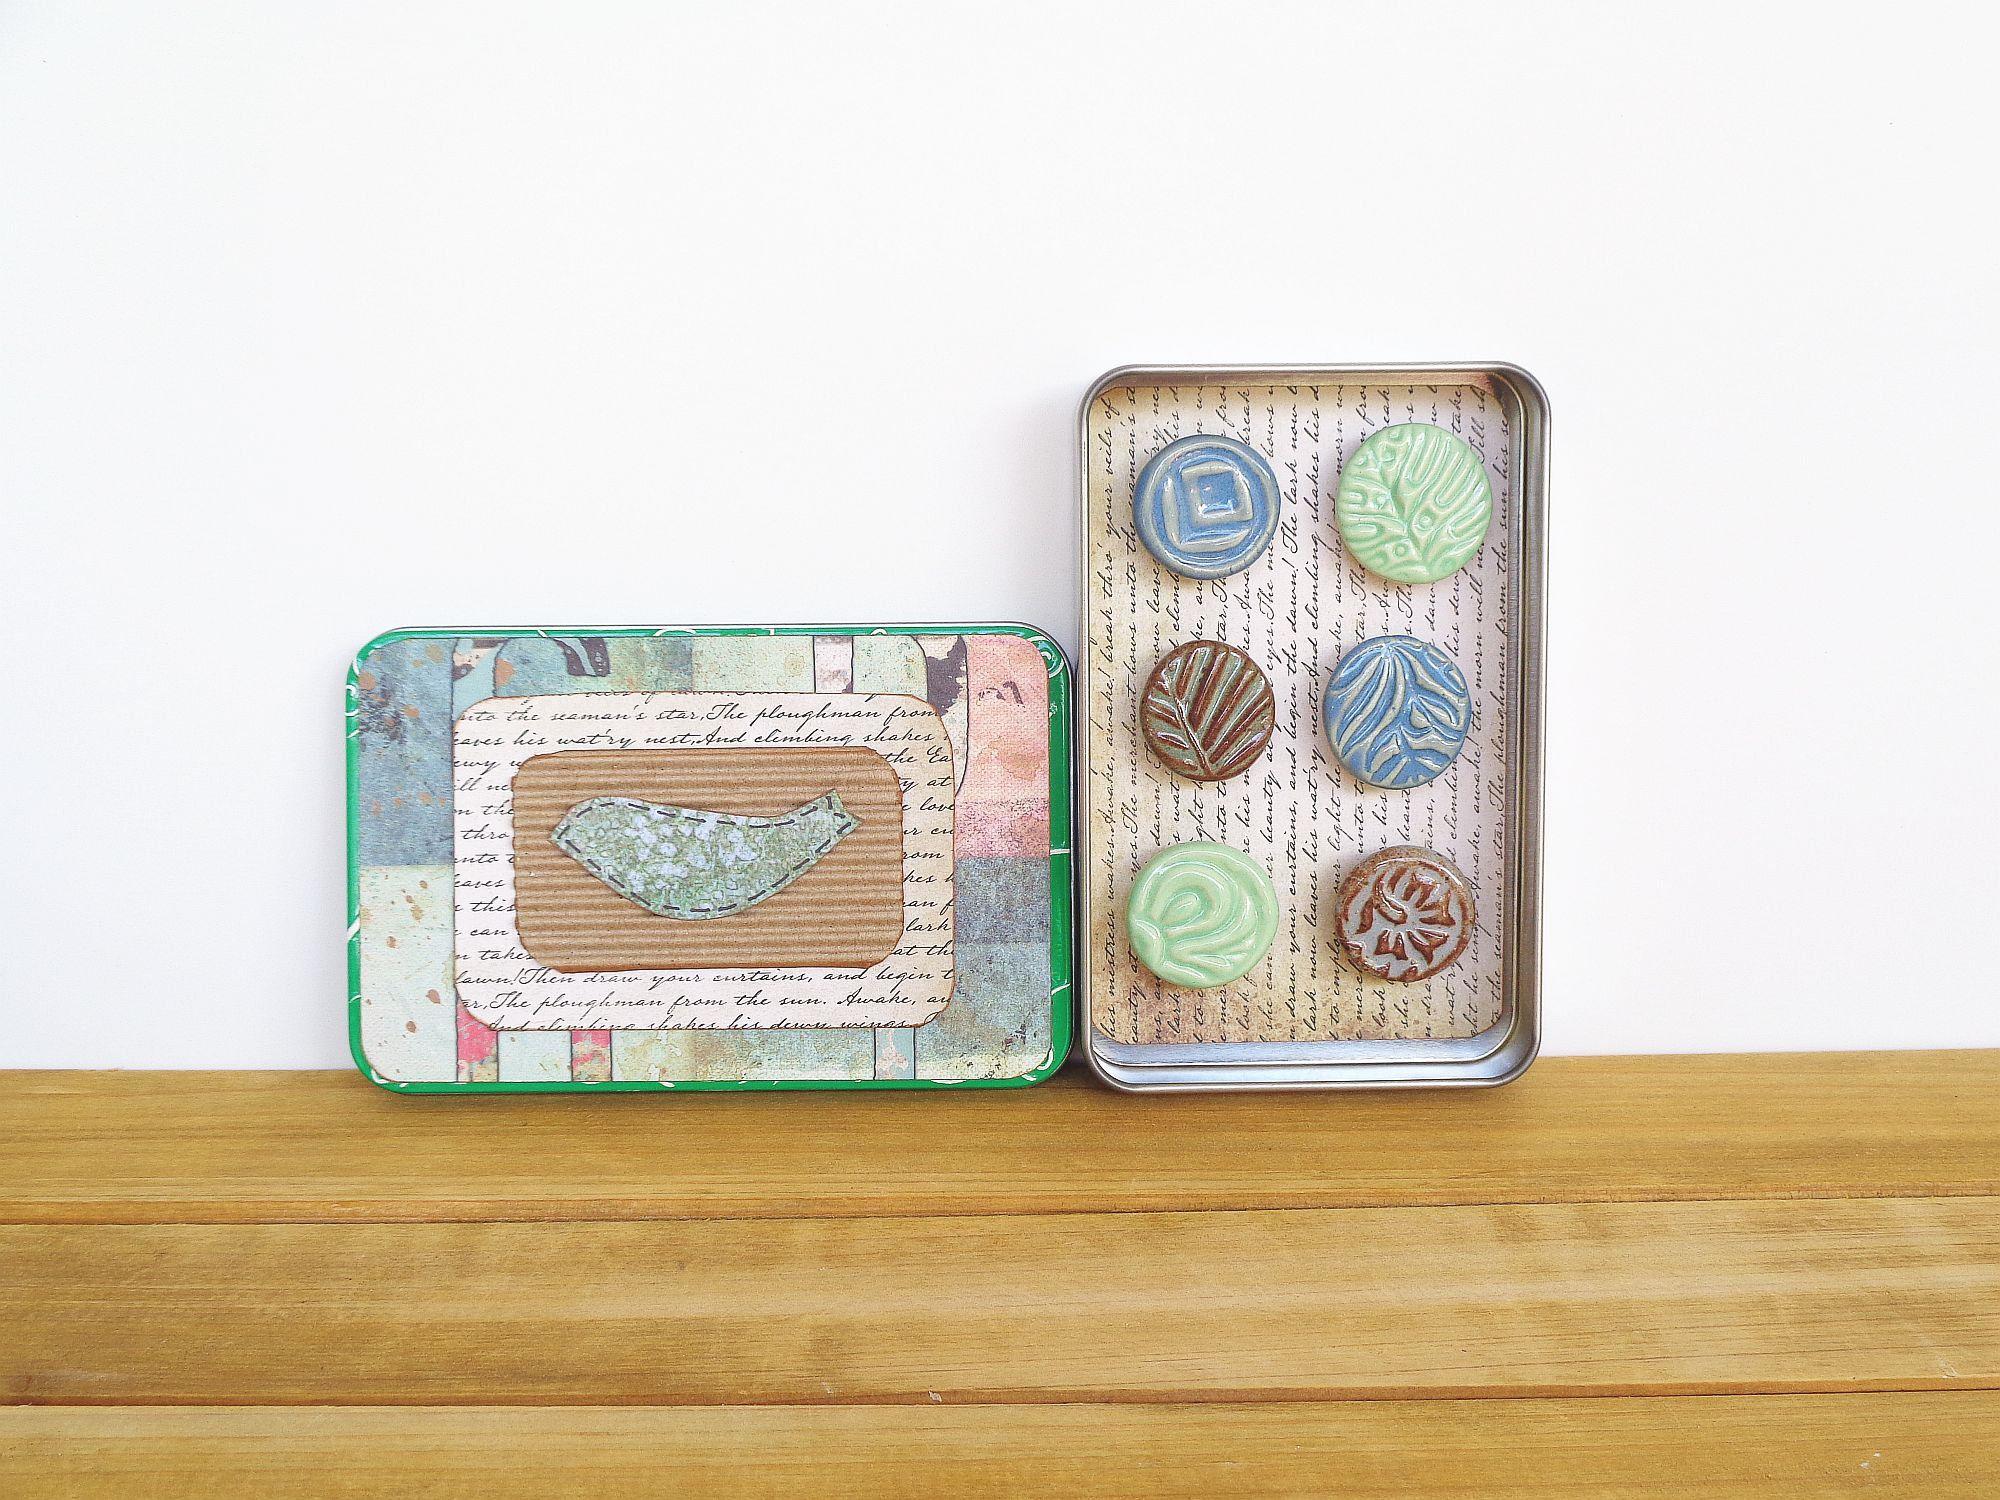 Ceramic Magnet Set Rustic Clay Fridge Magnet Set Of 6 Housewarming Gift Stocking Stuffer House Warming Gifts Handmade Fridge Magnets